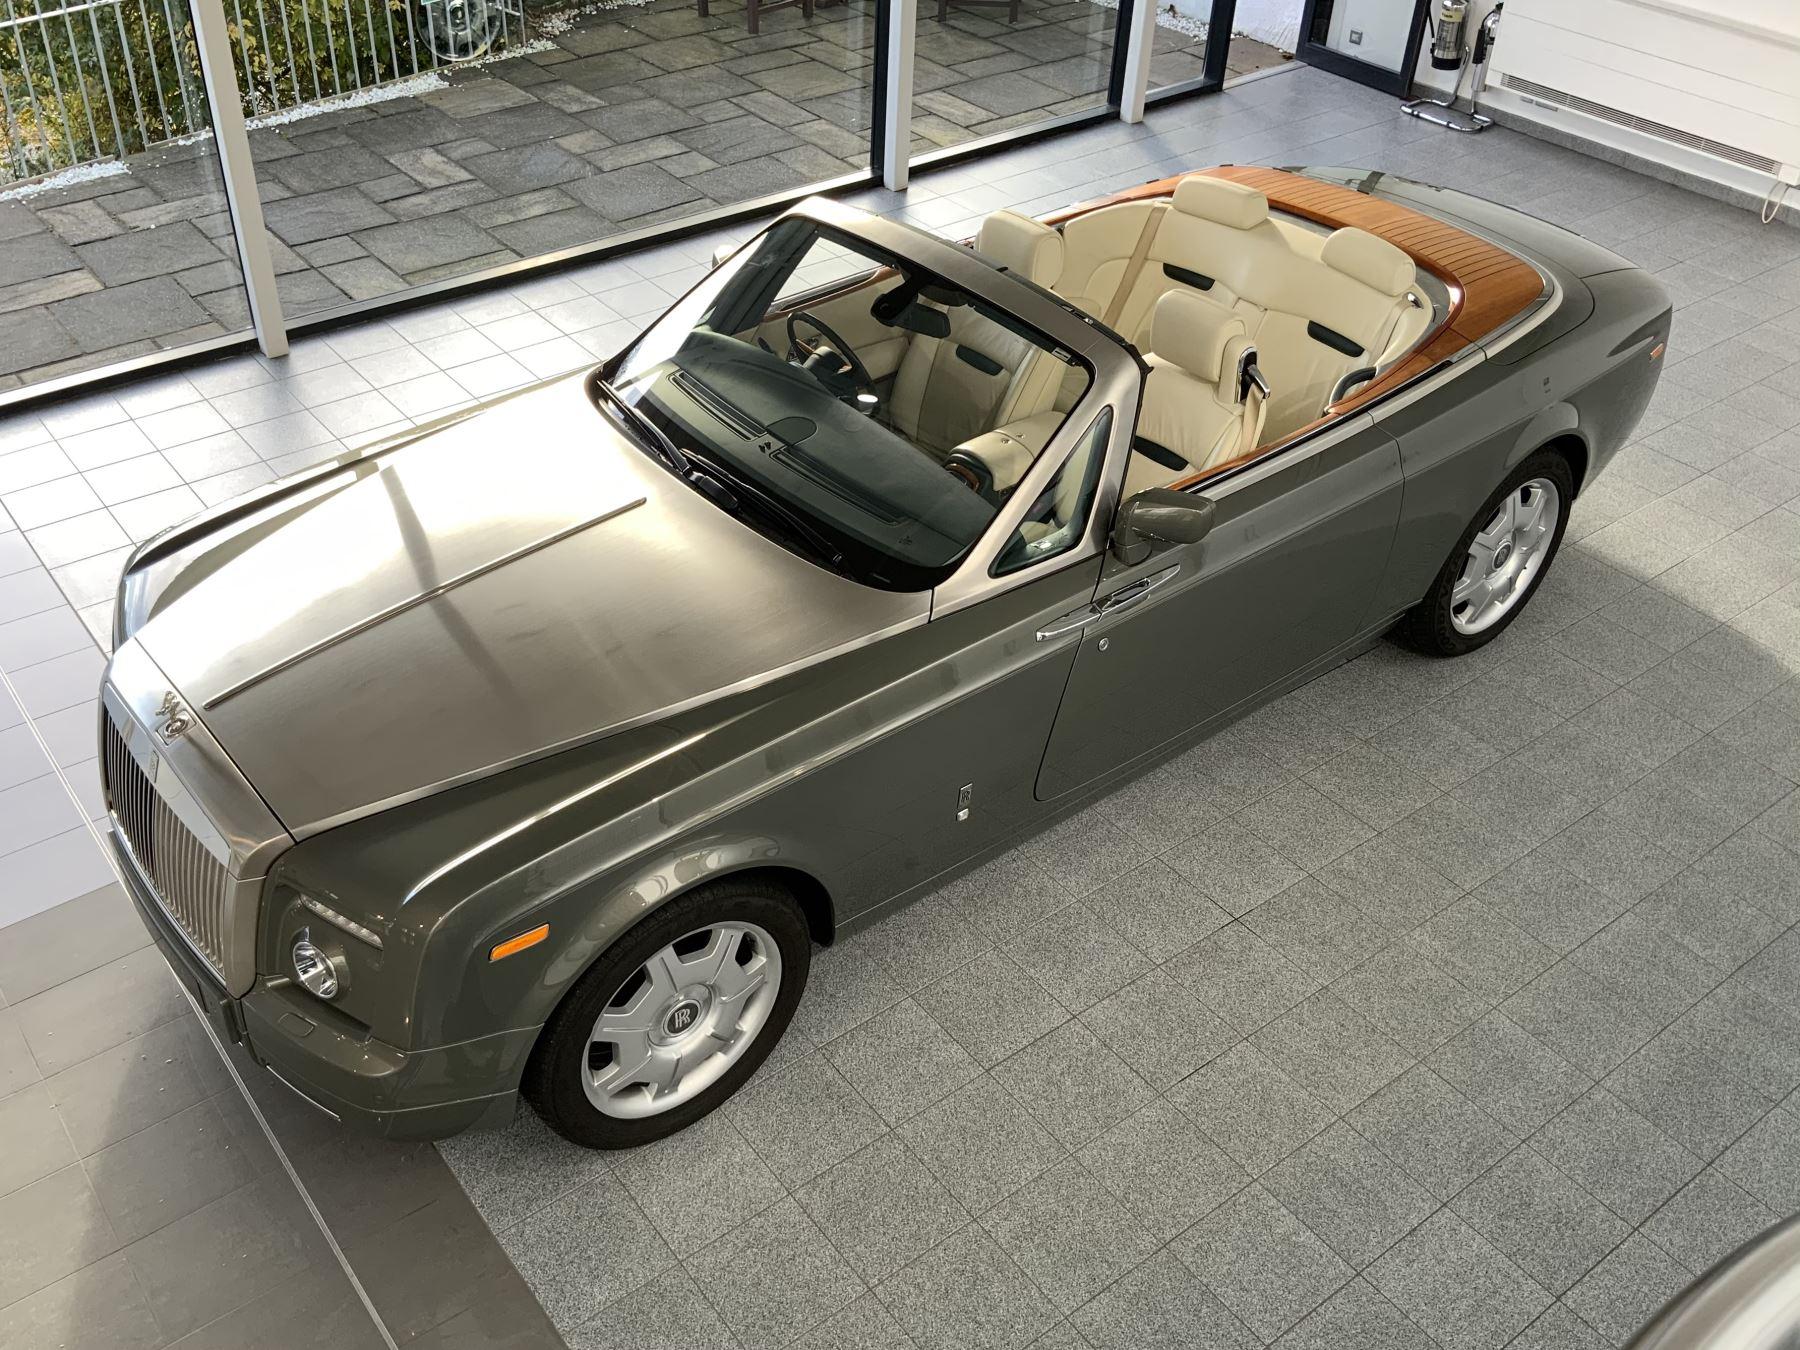 Rolls-Royce Phantom Drophead Coupe 2dr Auto image 31